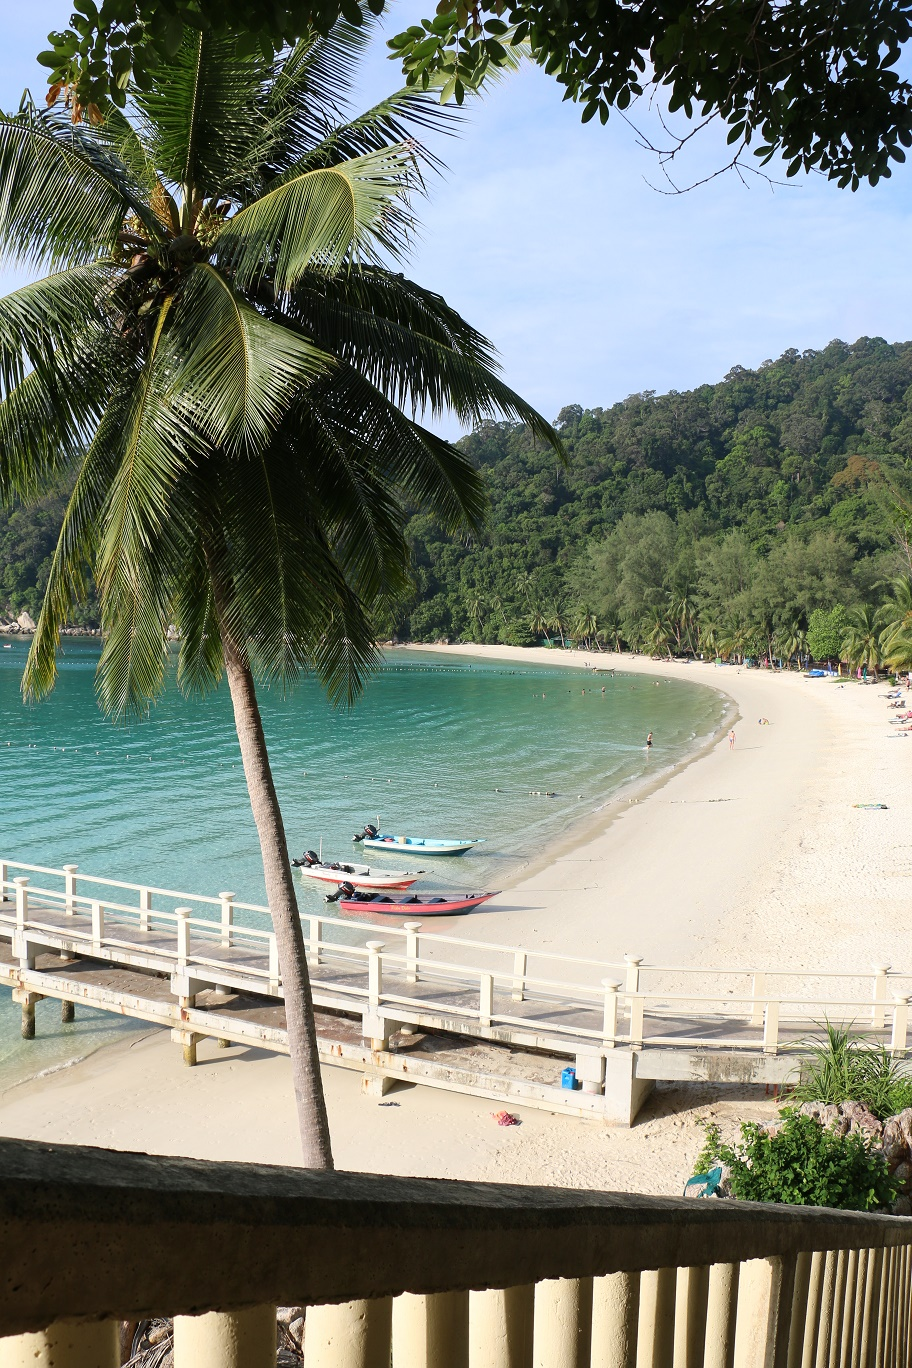 Pulau_Perhentian_Besar_Perhentian_Island_Resort_Beach_thebraidedgirl